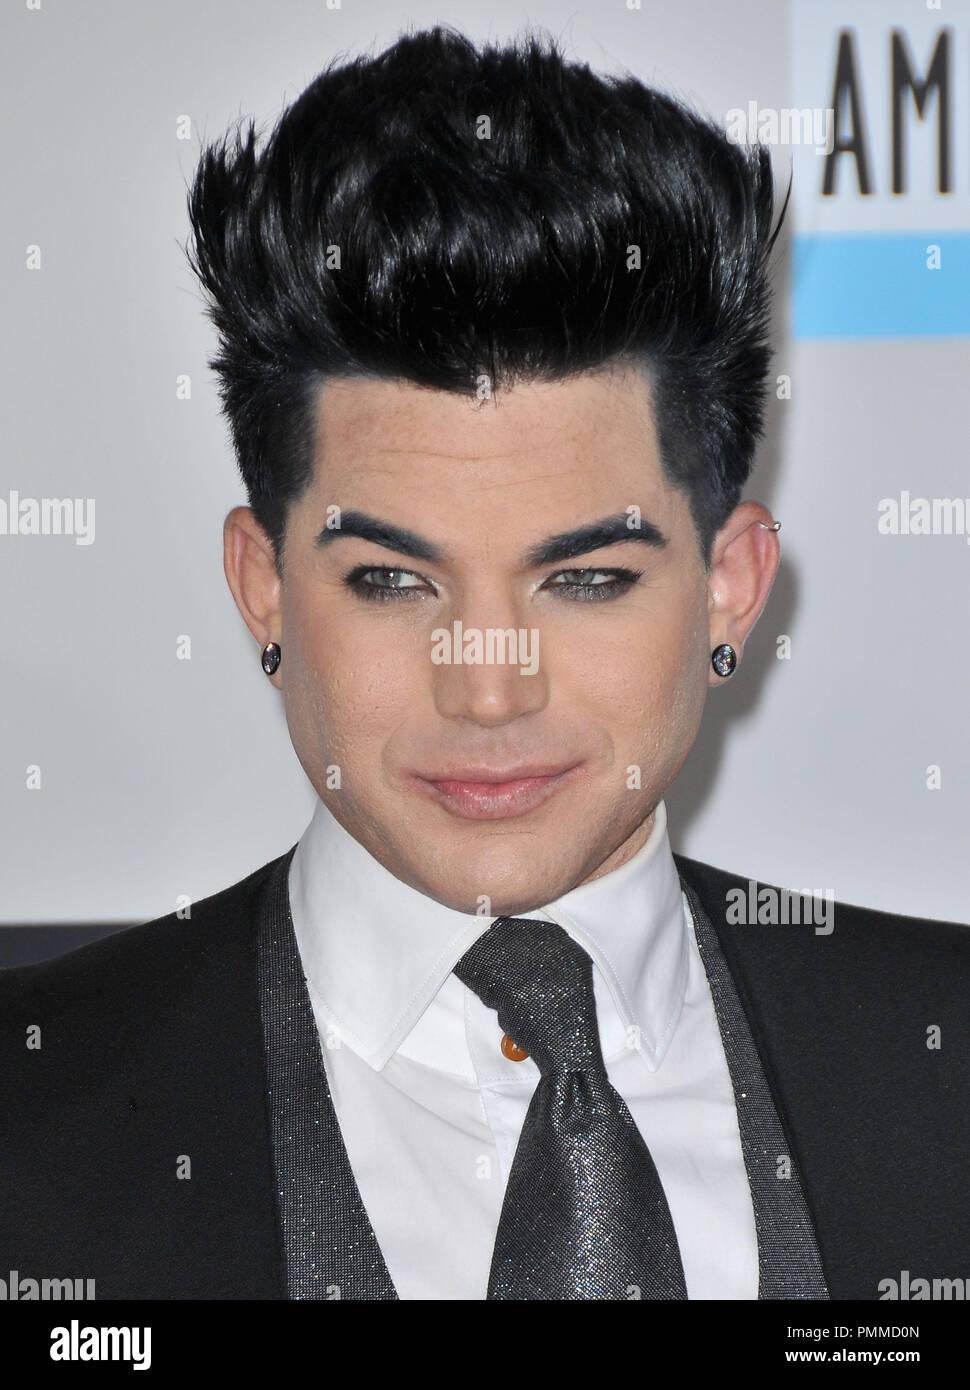 Adam Lambert dating historia